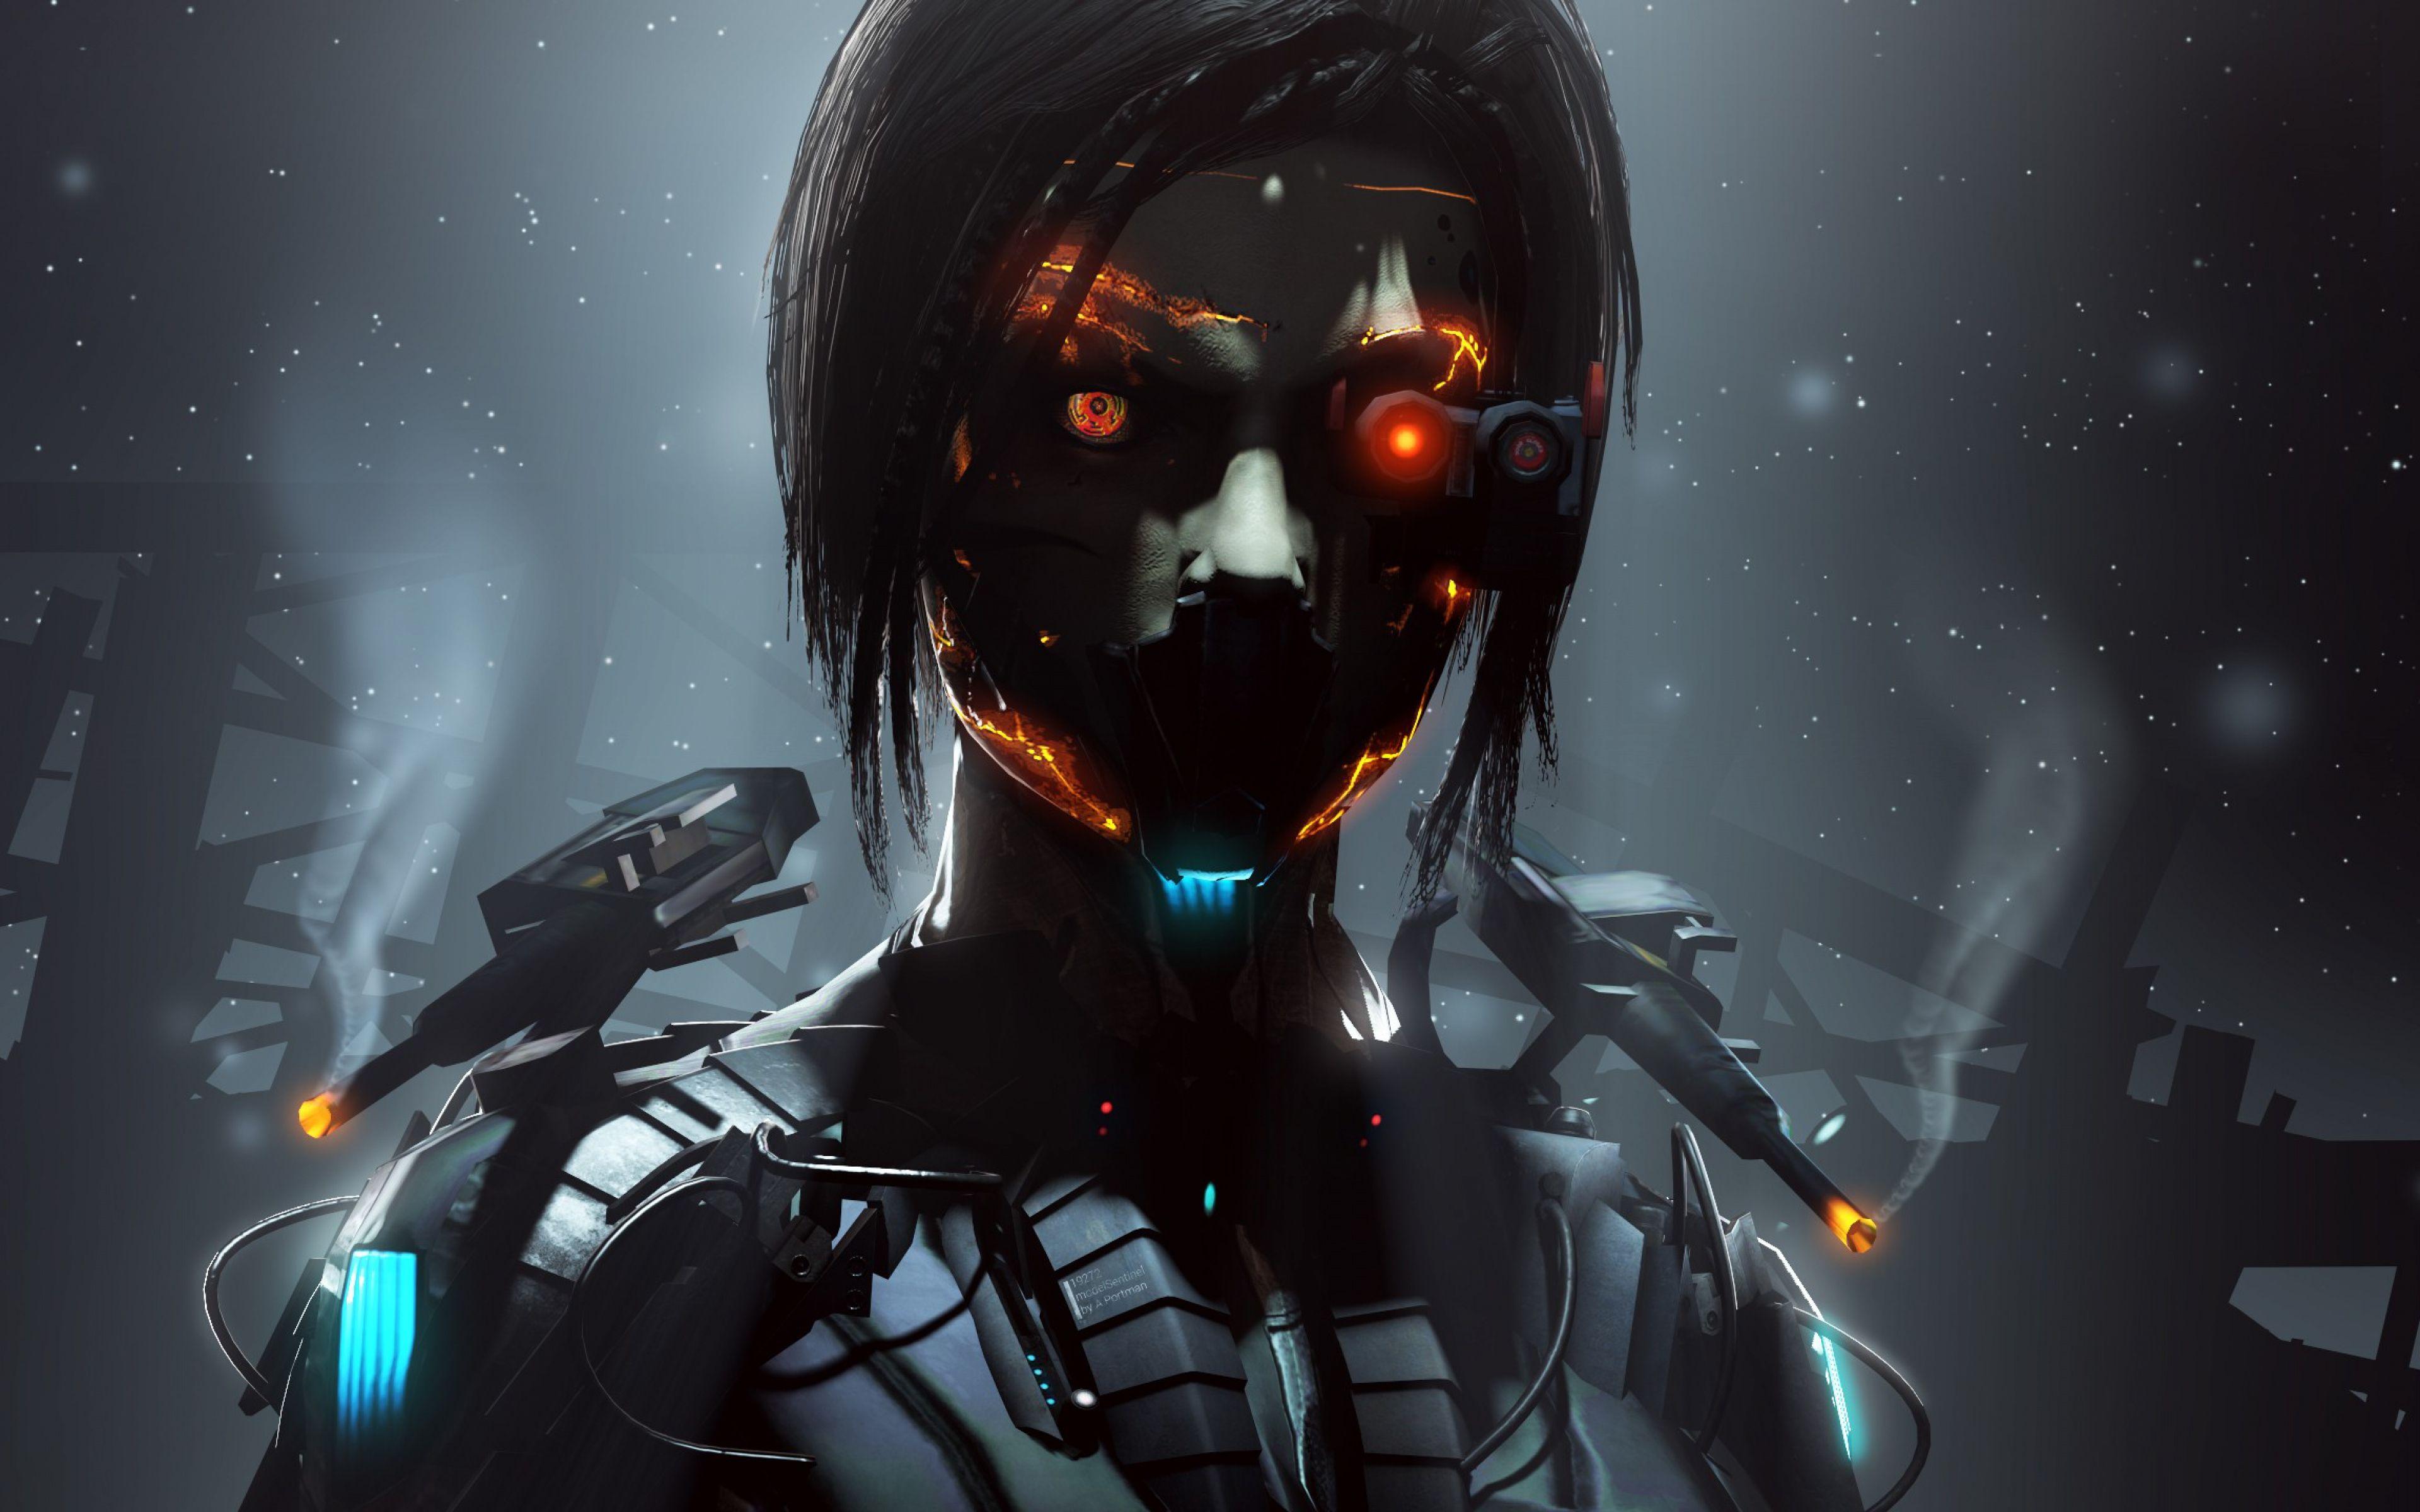 Girl robot cyborg orange eyes dark wallpapersbyte com - Robot wallpaper 3d ...